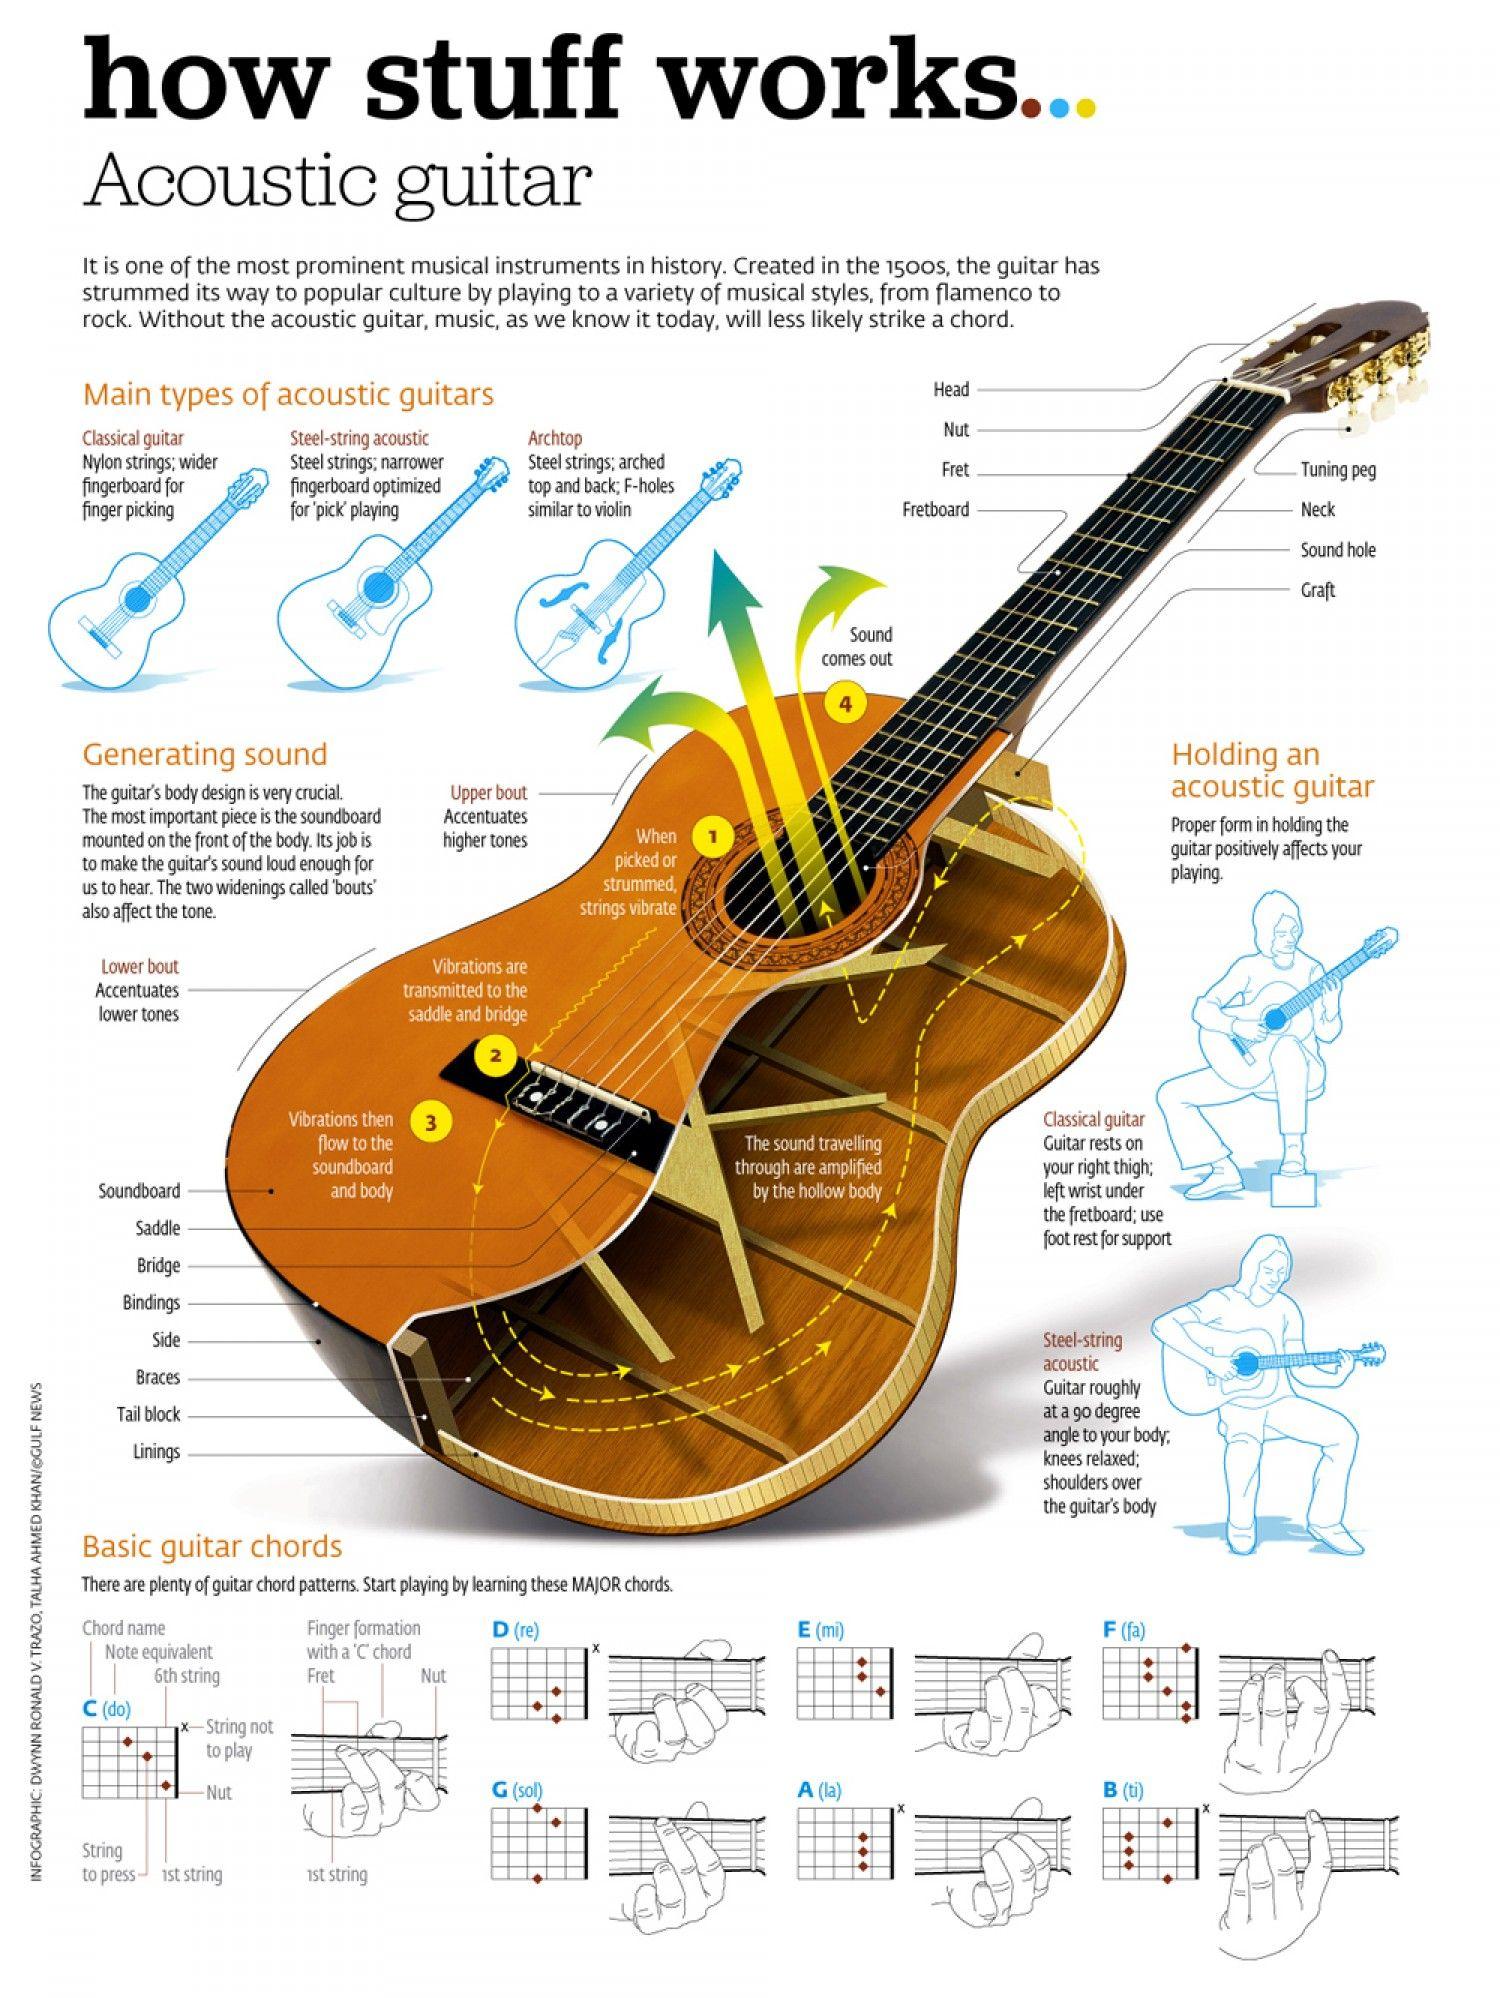 Anatomy of the acoustic guitar. http://www.guitarandmusicinstitute ...